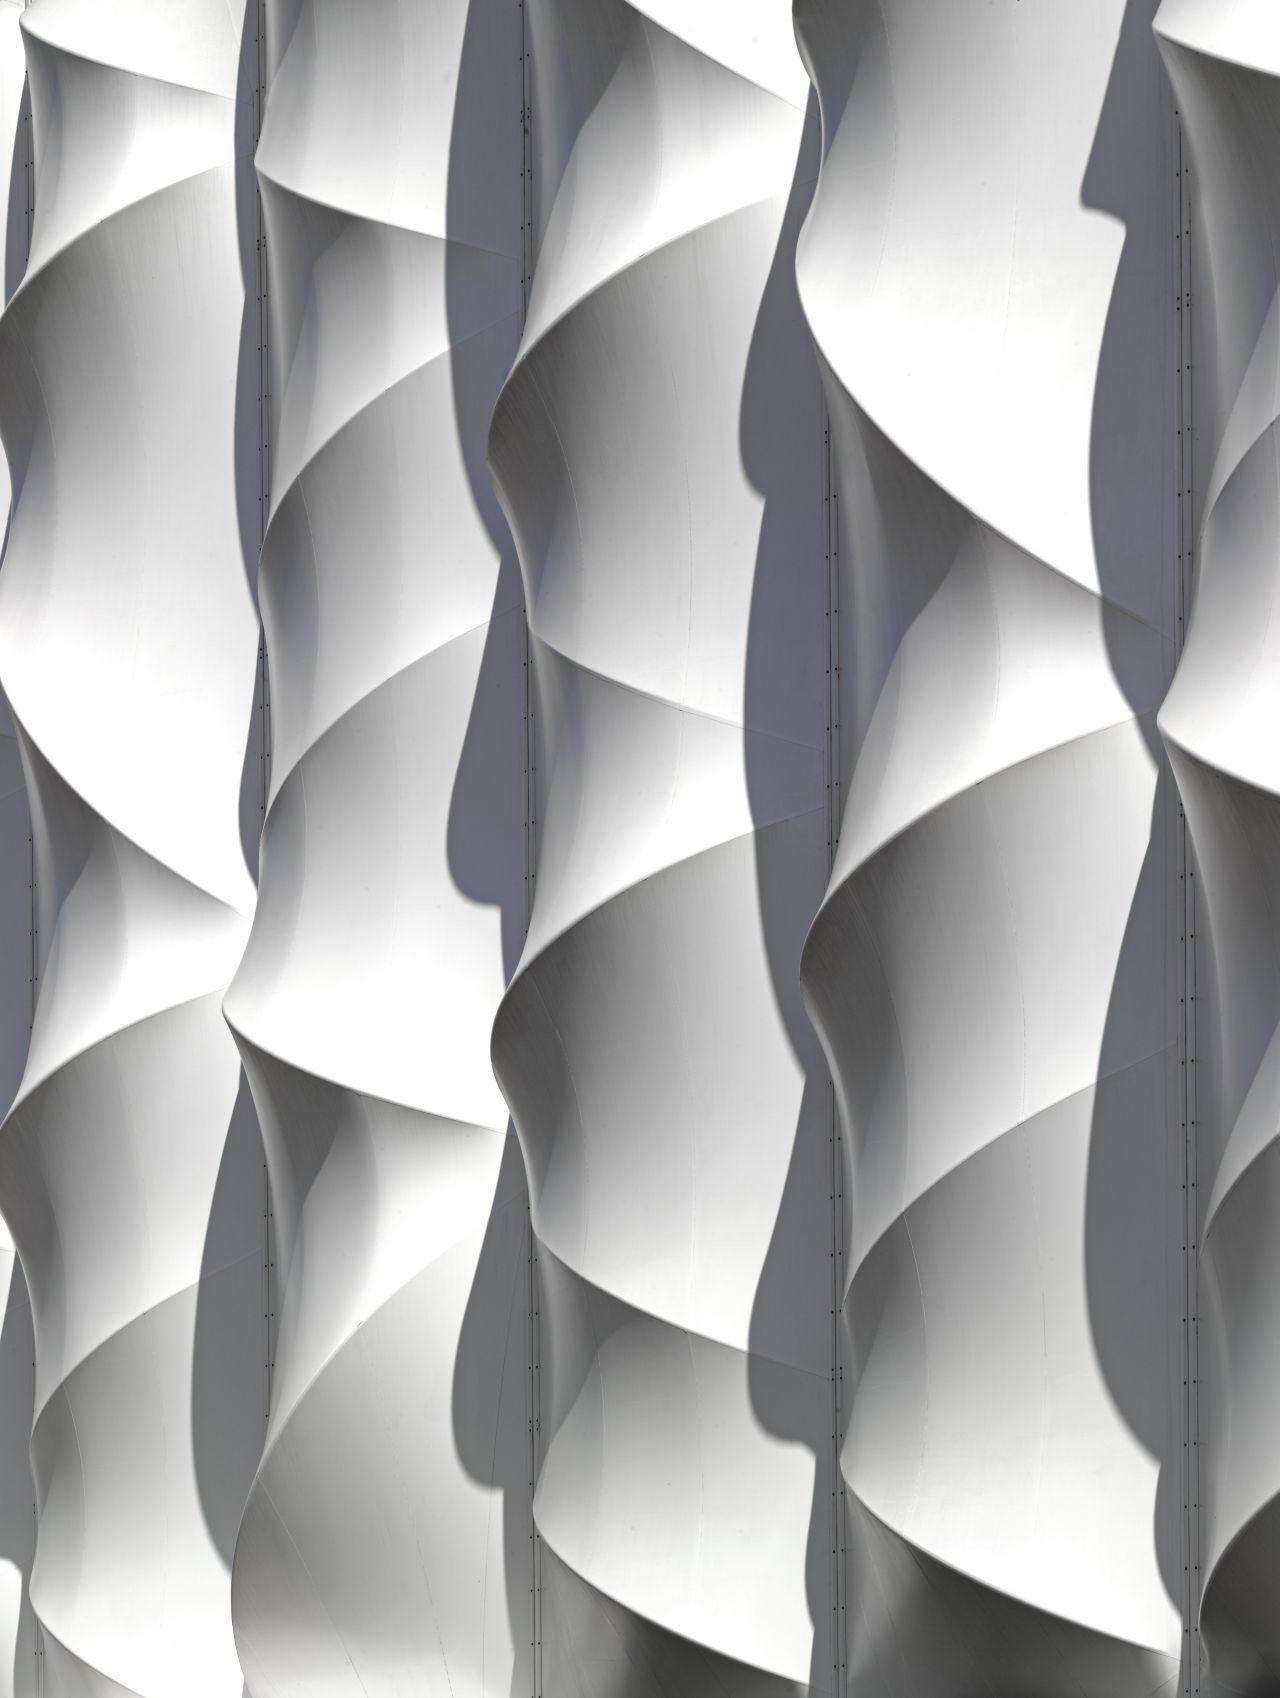 Galeria - Basketball Arena de Londres 2012 / Wilkinson Eyre Architects - 141